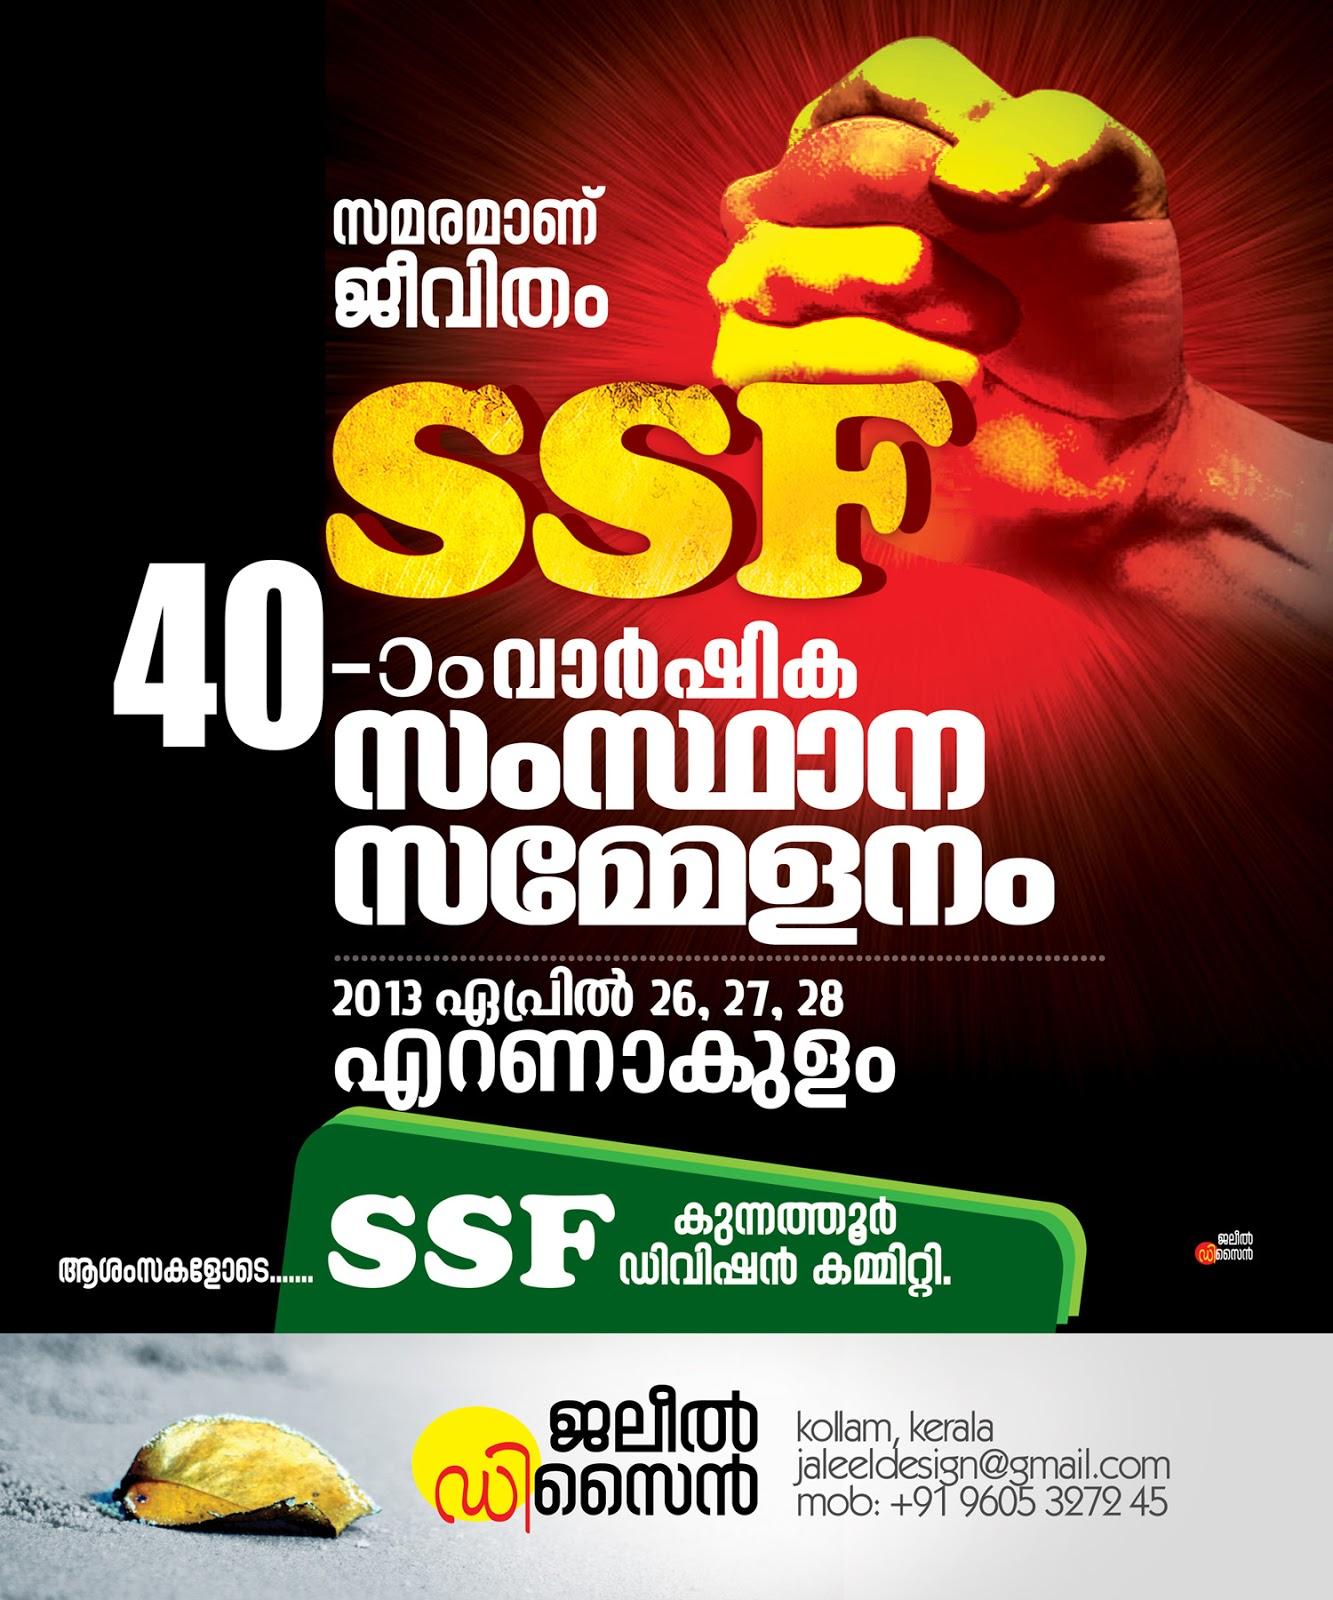 Ssf 40 varshikam anniversary conference designs photos j for Ssf home designs